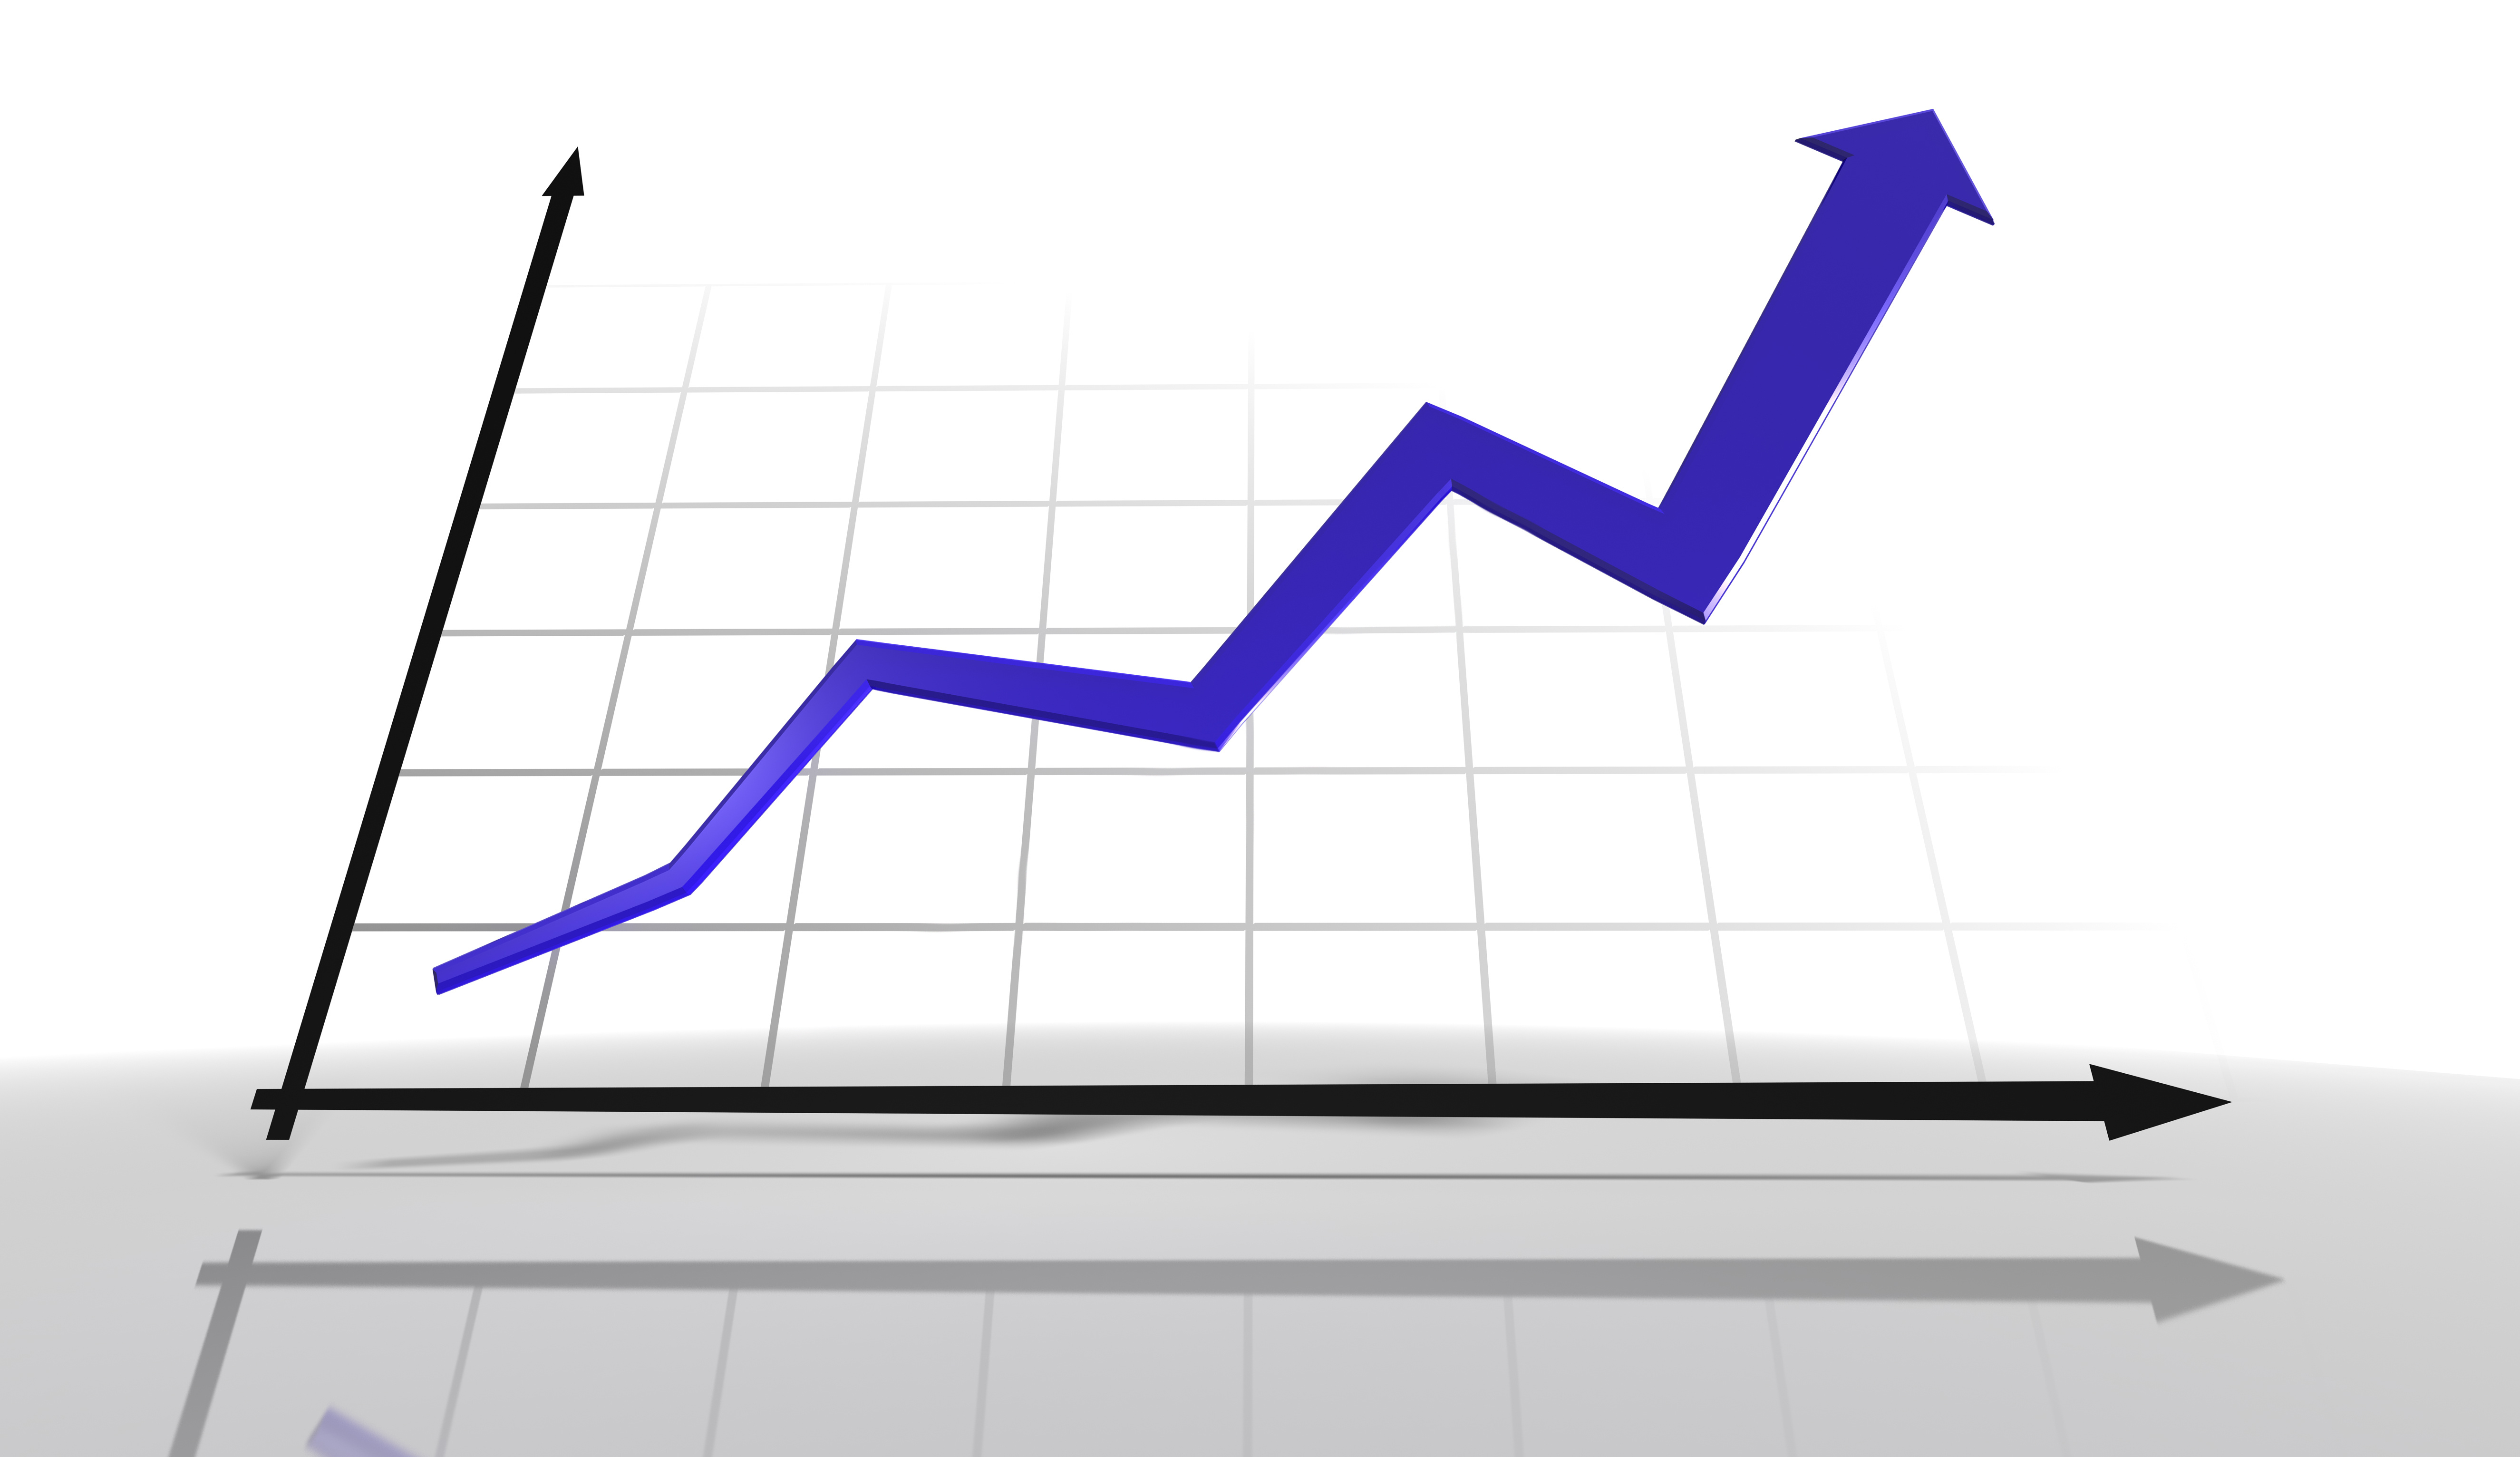 Pubblicità, dati Nielsen: vola internet, +15%